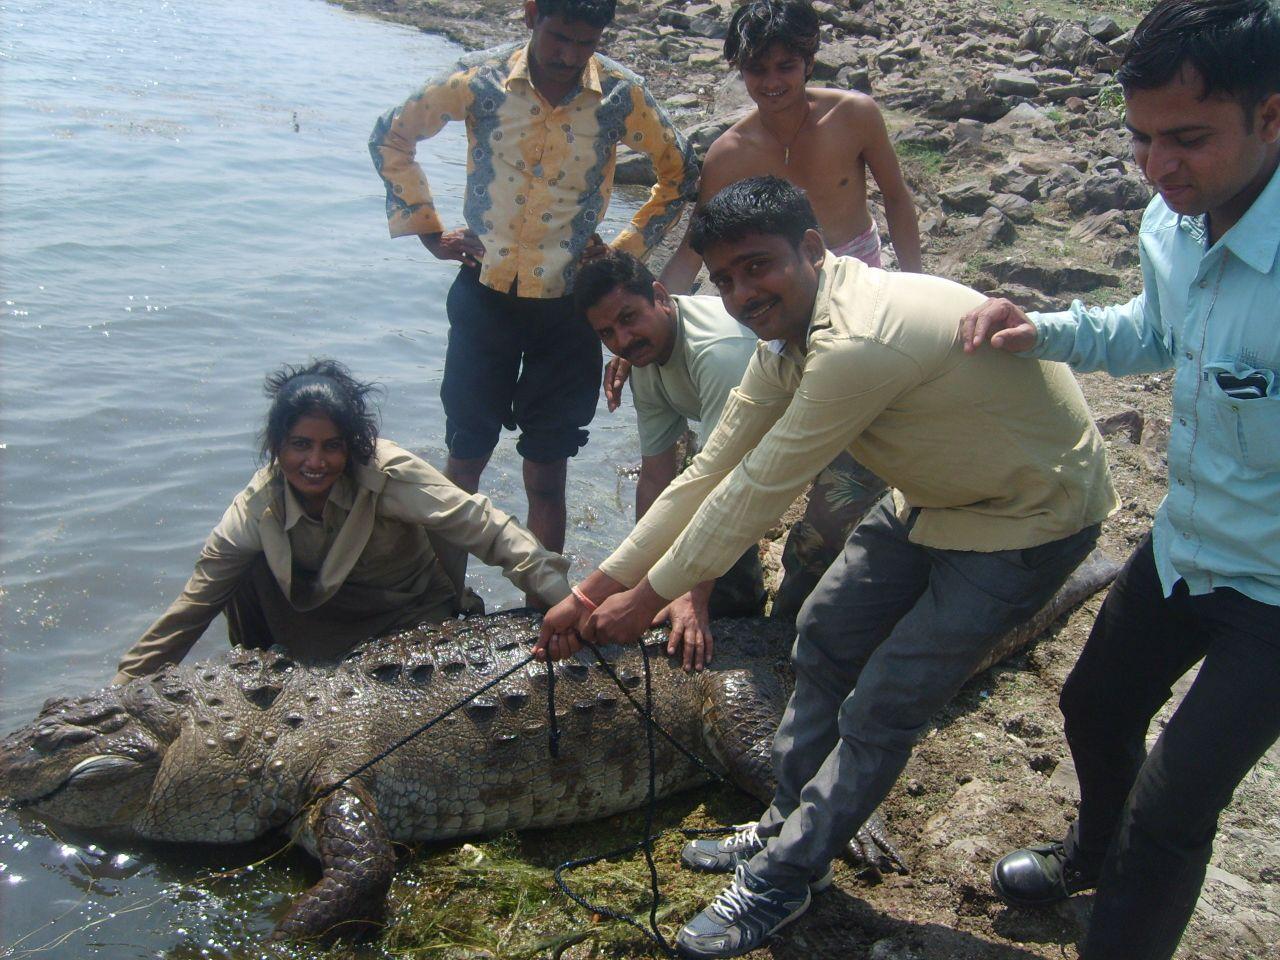 Ranger_crocodile Οι φύλακες της άγριας ζωής του πλανήτη   Ψάρεμα  - Συζητήσεις - Σκάφος